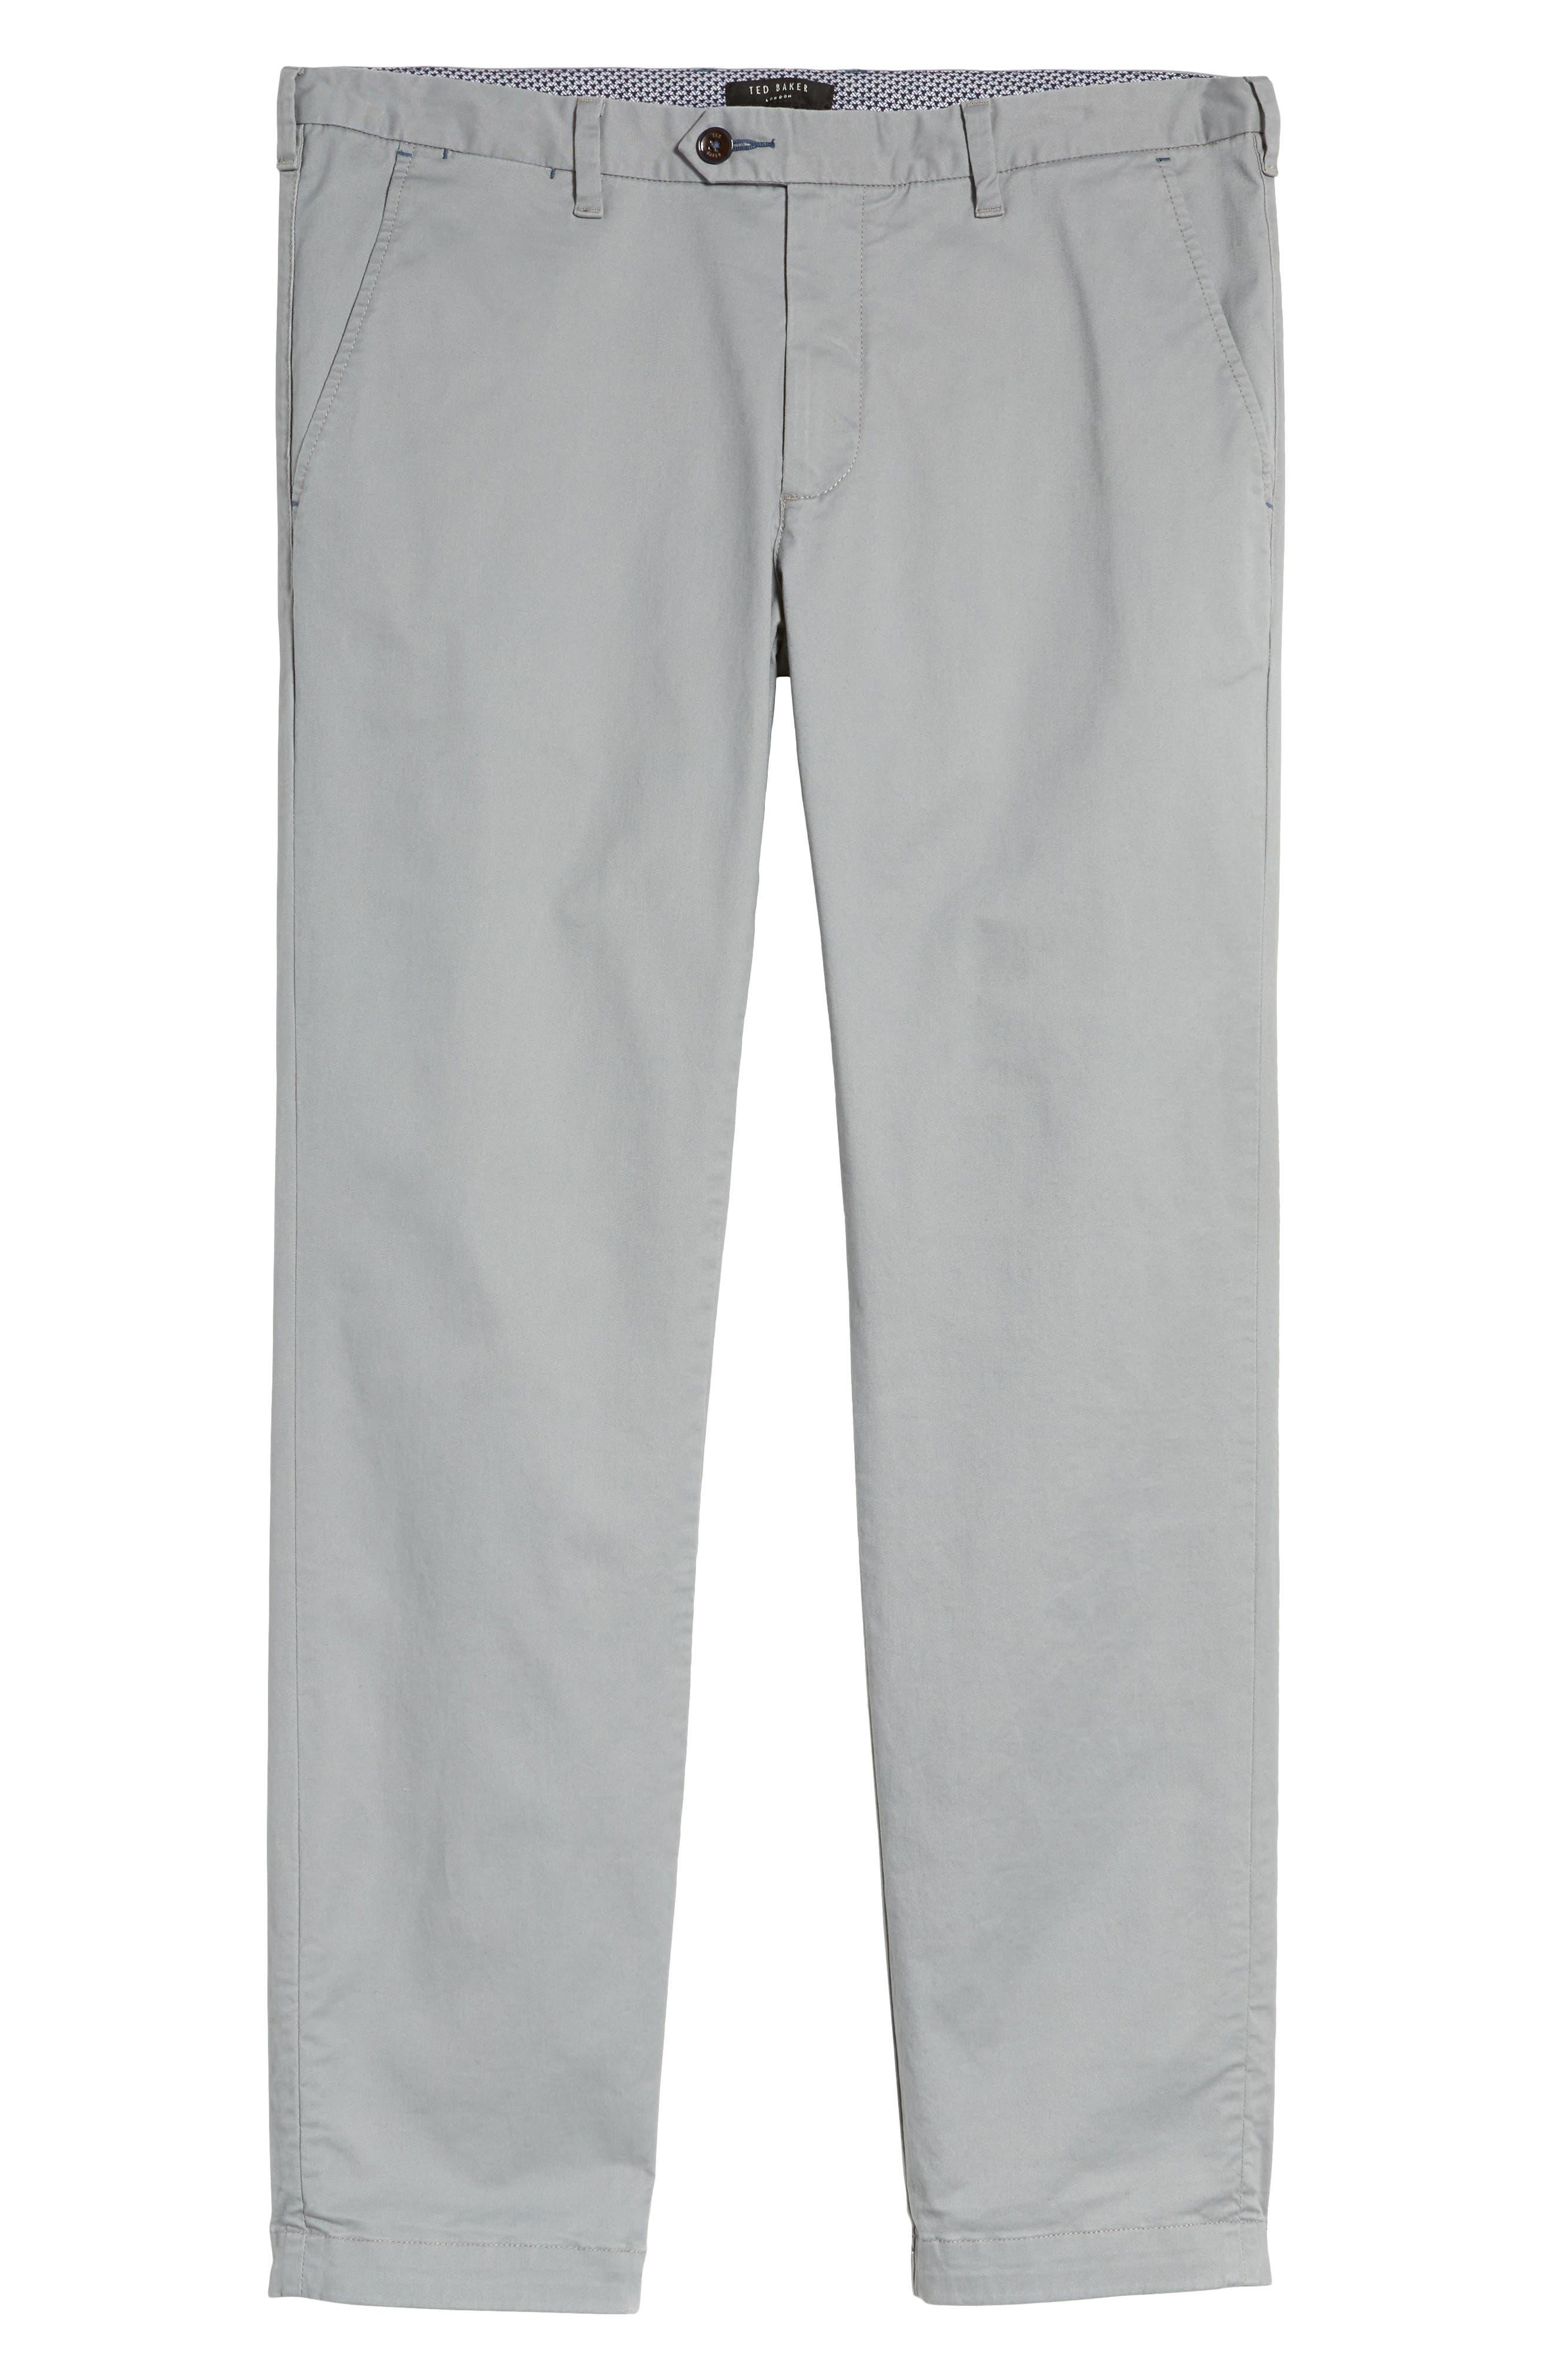 Procor Slim Fit Chino Pants,                             Alternate thumbnail 6, color,                             050